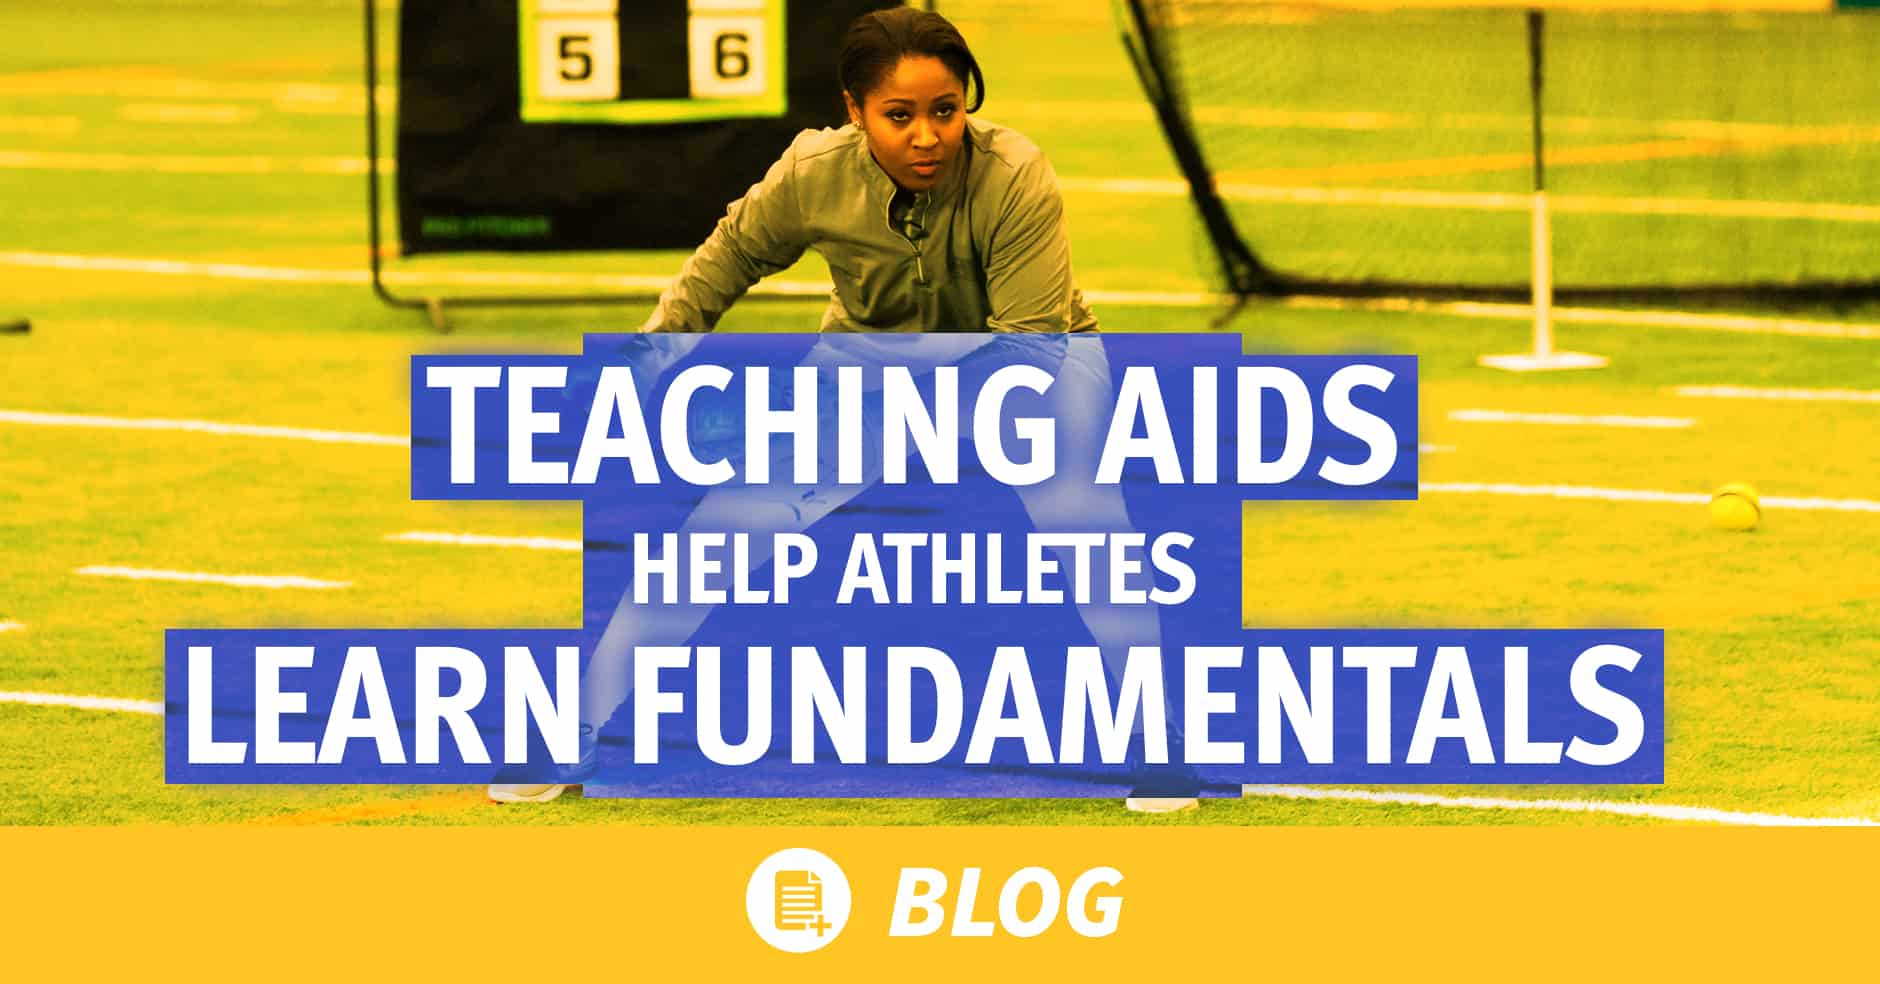 Teaching Aids Help Athletes Learn Fundamentals